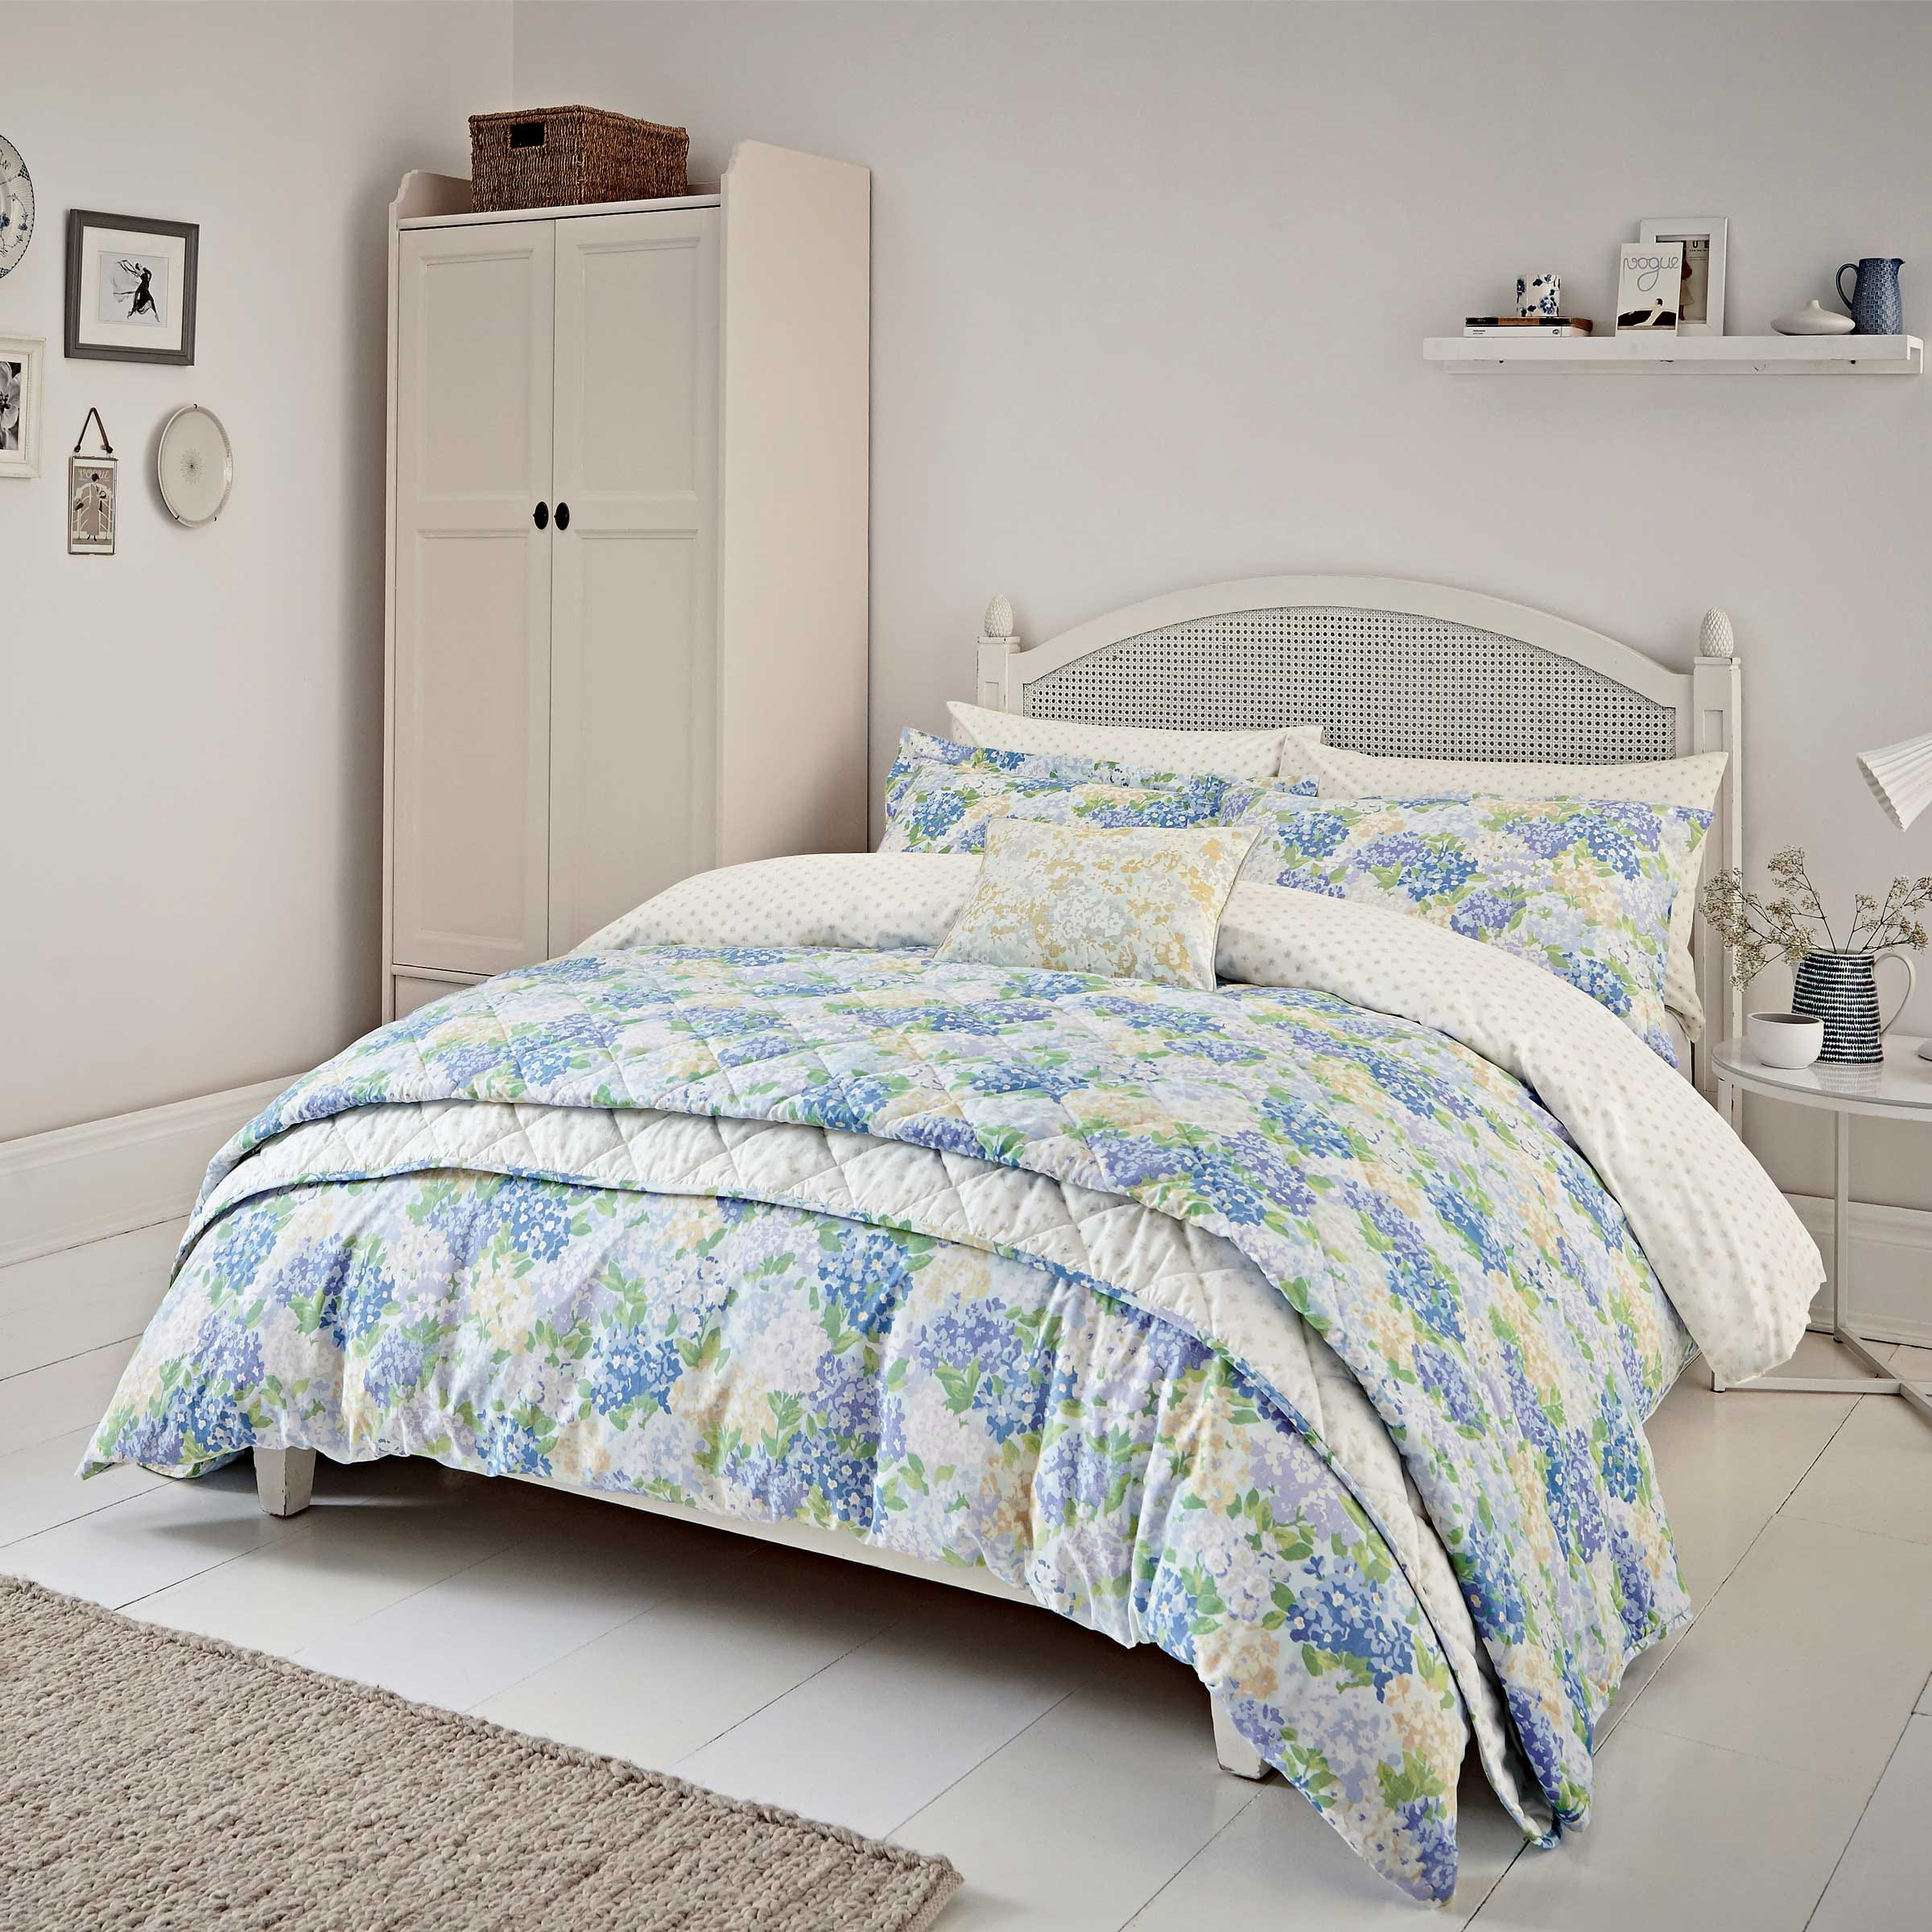 Sanderson Bedding Cottage Garden Super Kingsize Duvet Cover Set Blue